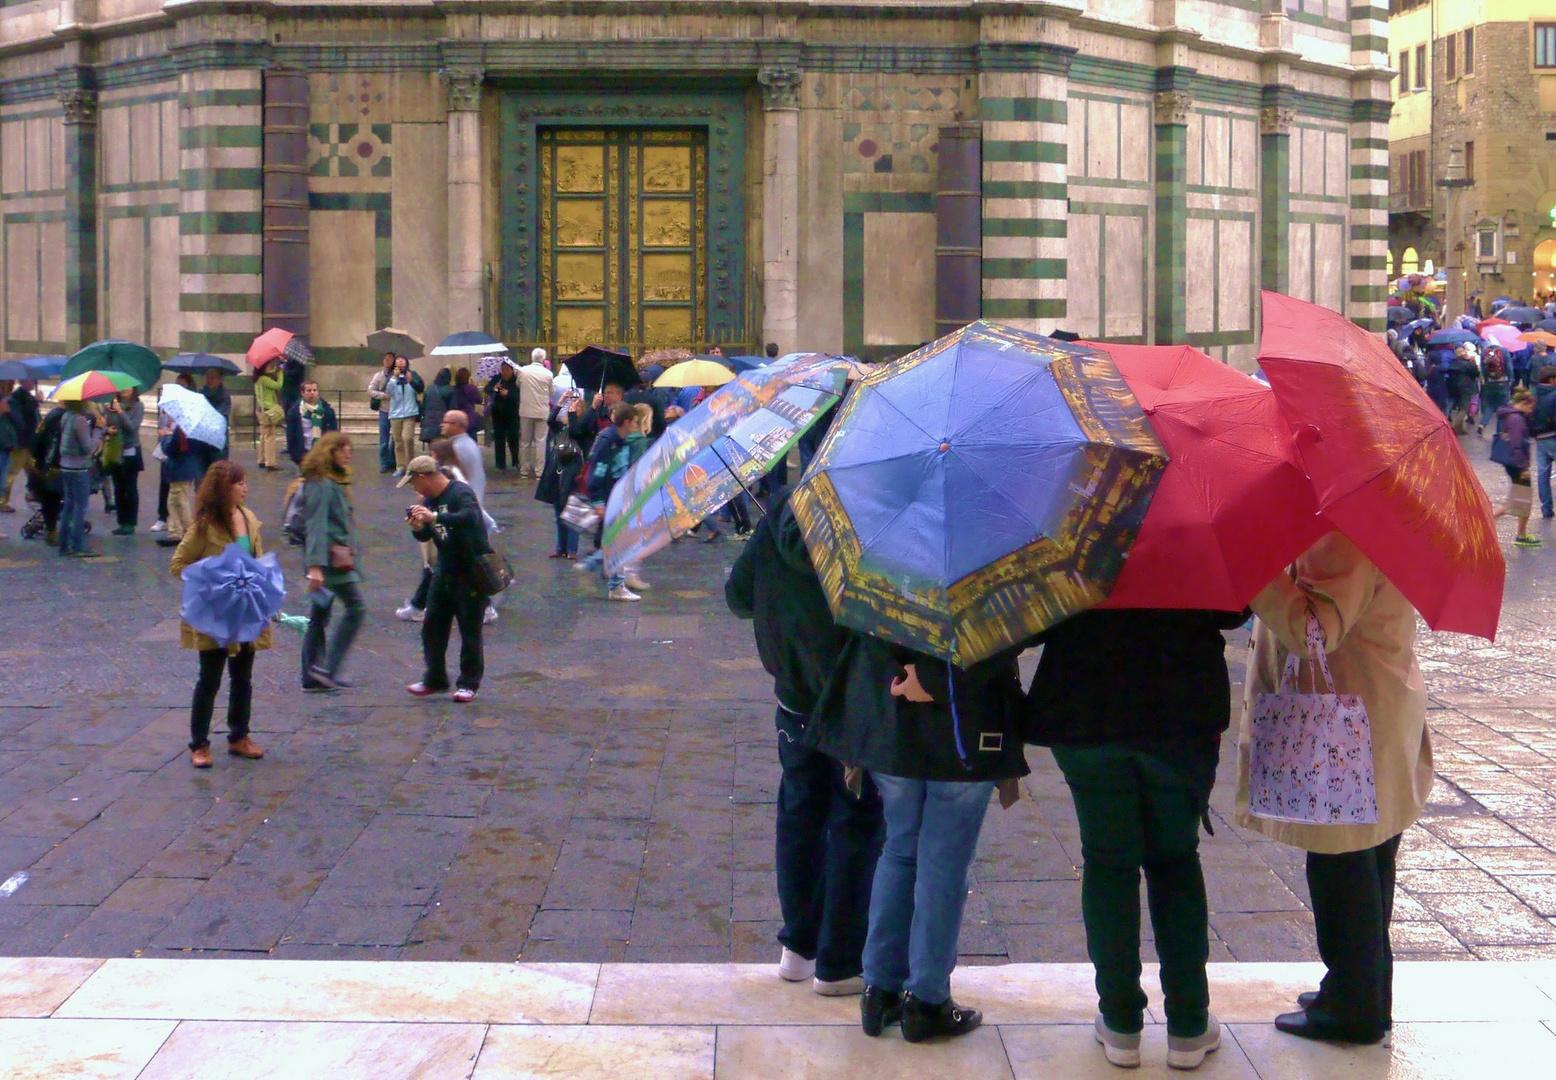 5-Euro-Rettungs-Schutz-Schirme